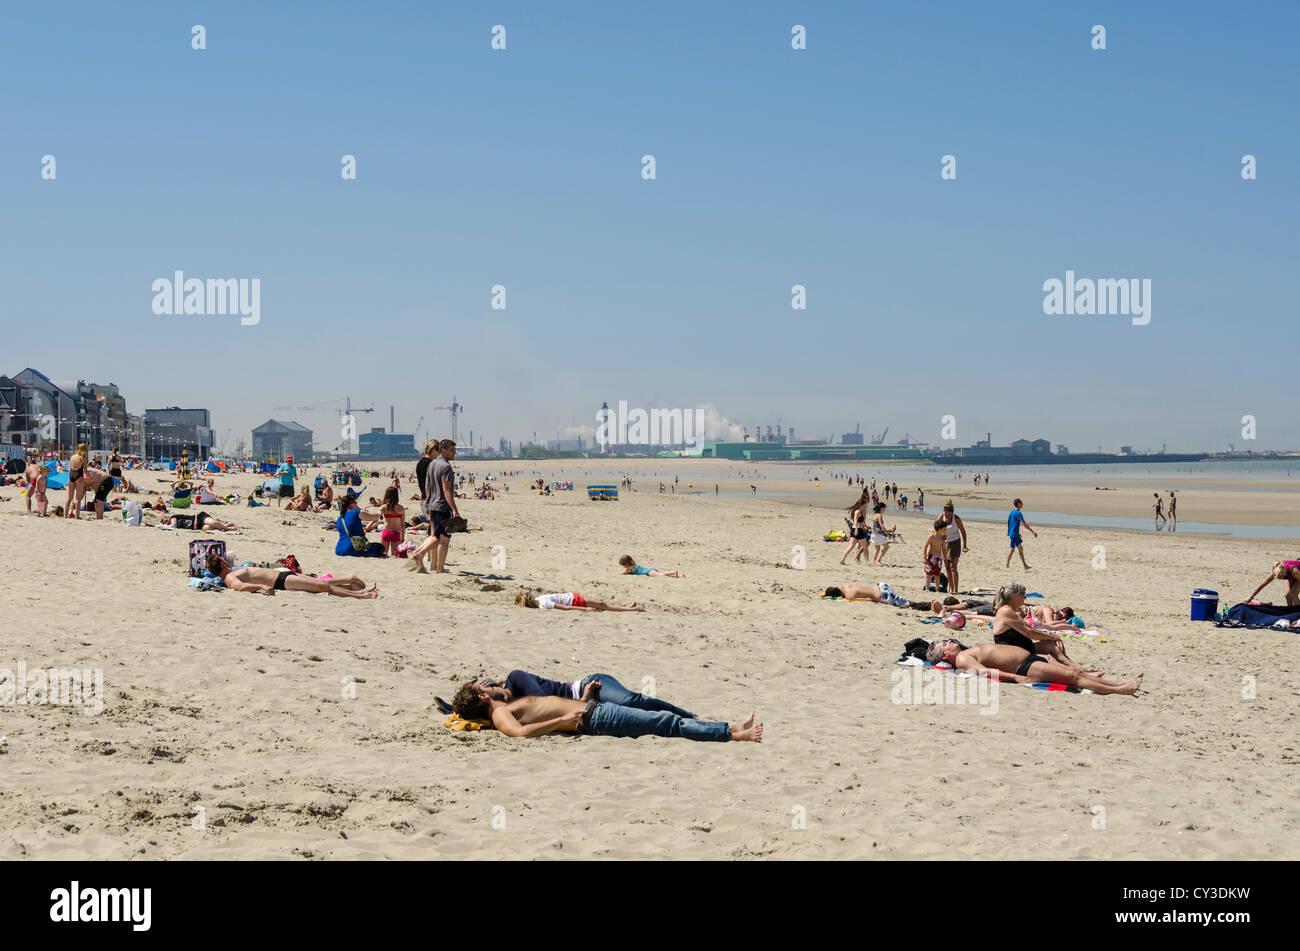 Sunbathers on Dunkirk beach, Northern France - Stock Image